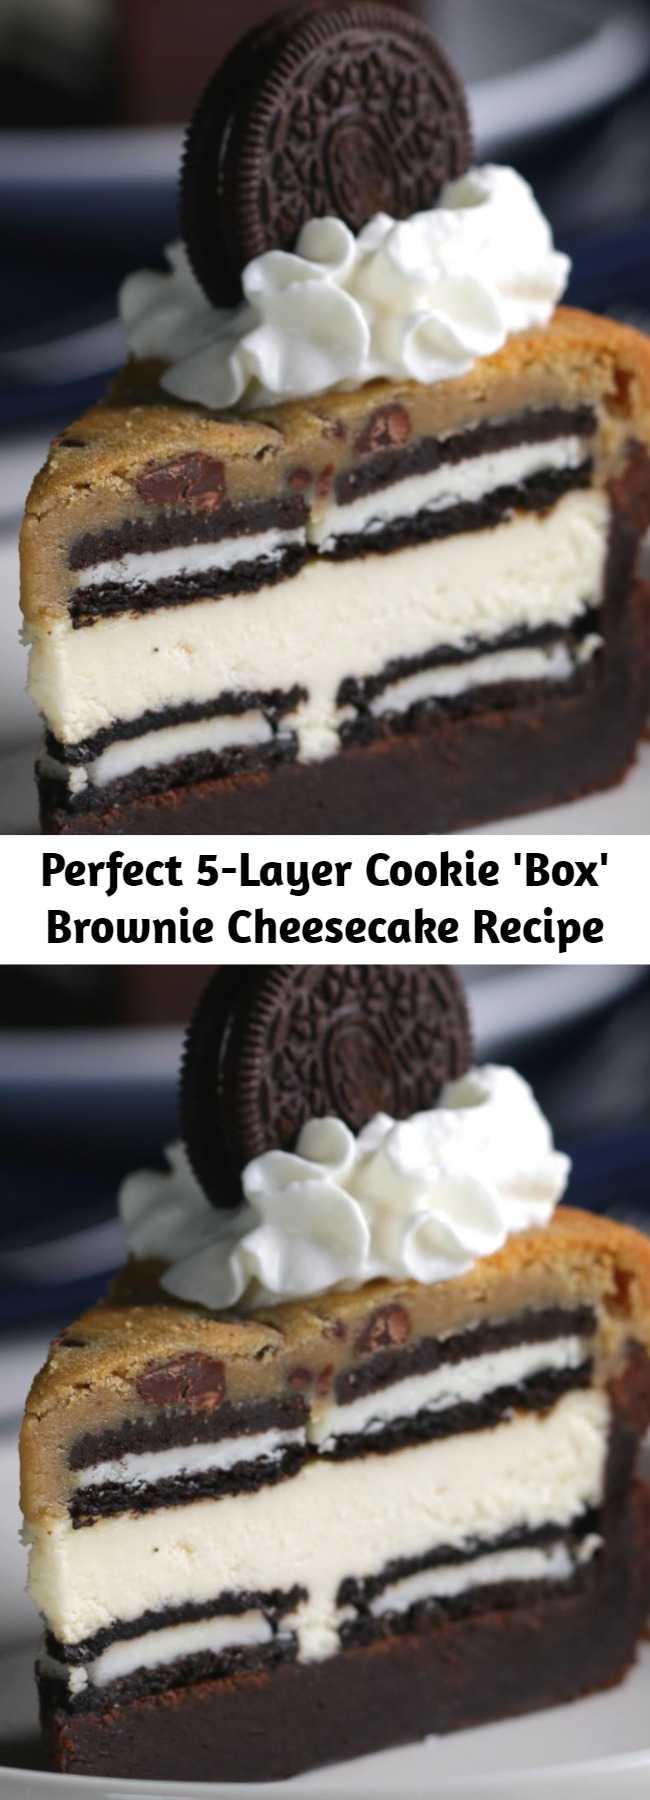 Perfect 5-Layer Cookie 'Box' Brownie Cheesecake Recipe - Tastes amazing!